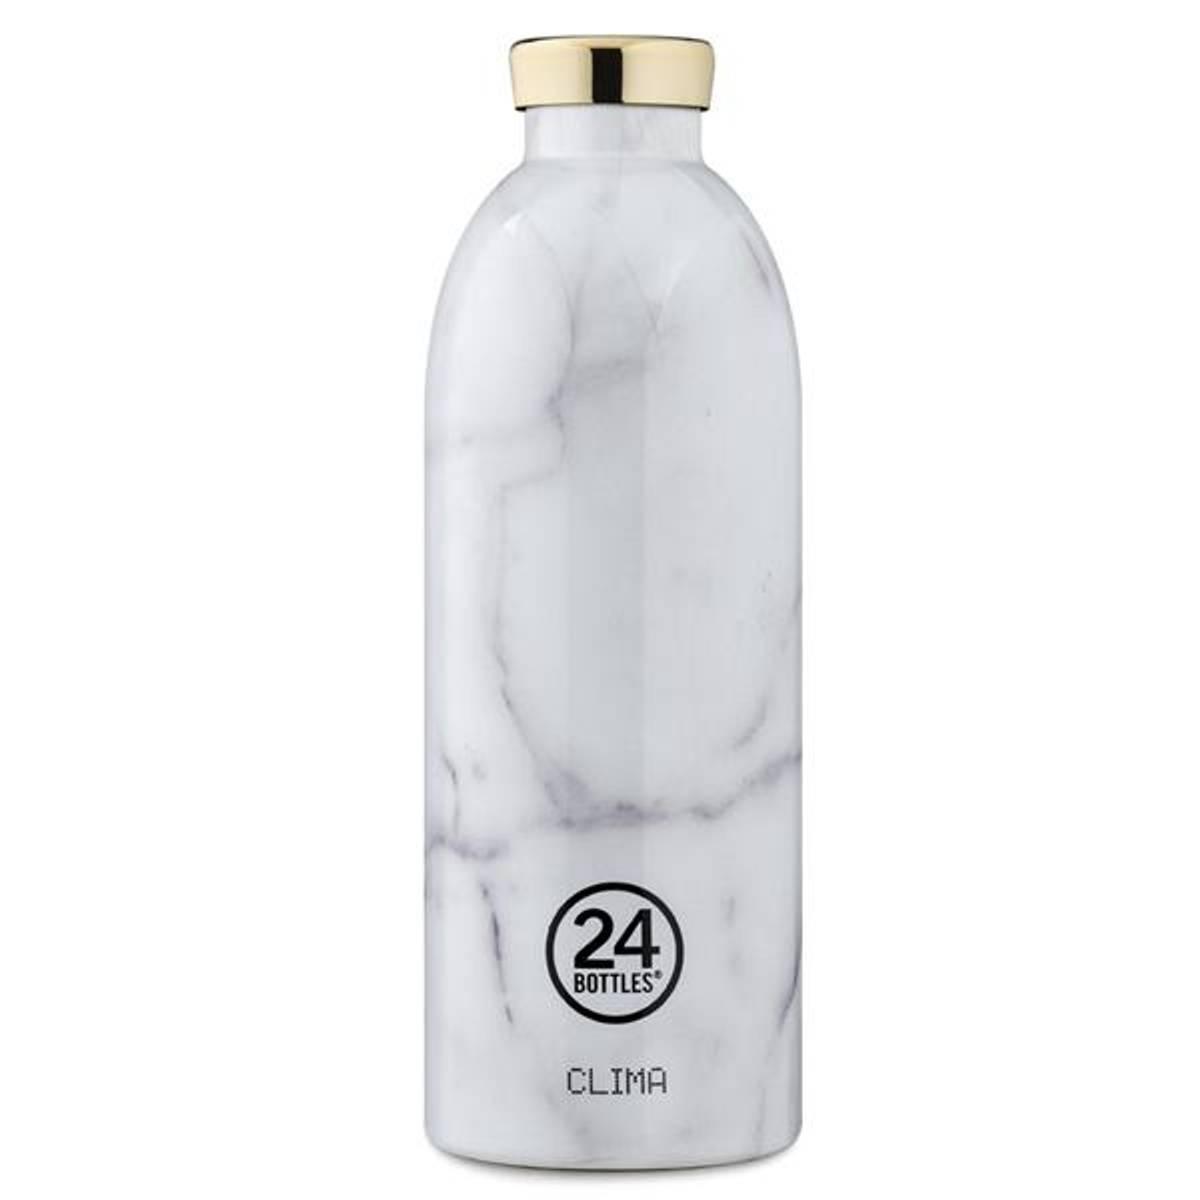 24Bottles Clima 850 ml Carrara